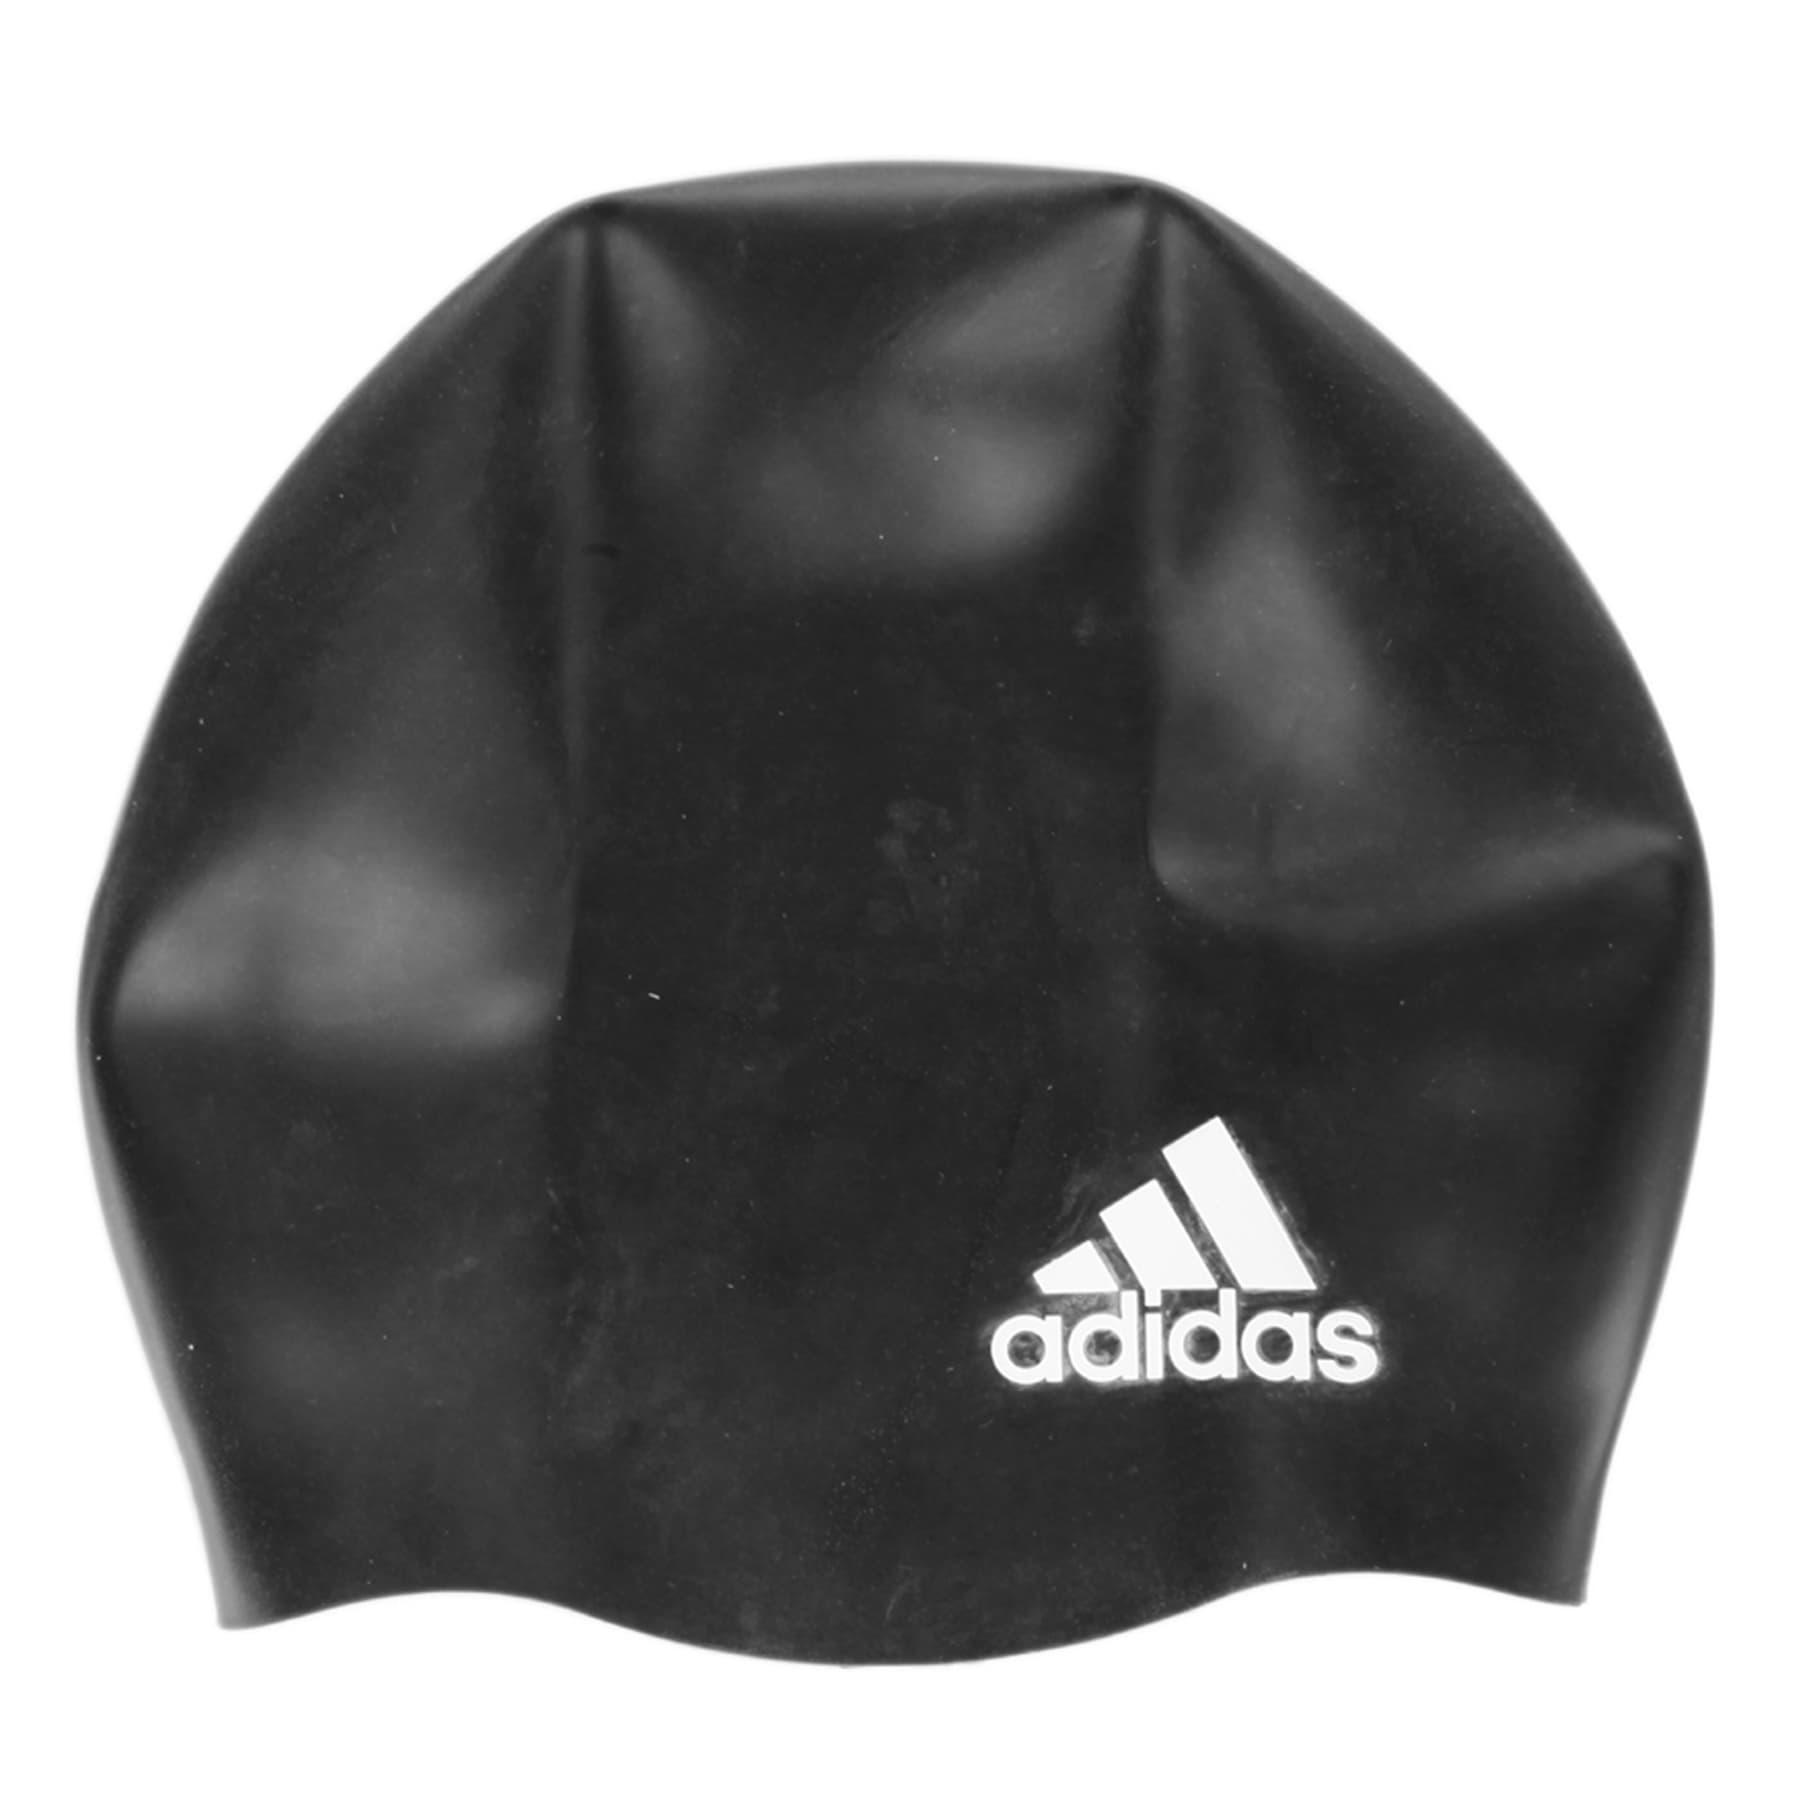 adidas Slikon Logo Siyah Yüzücü Bonesi (802316)